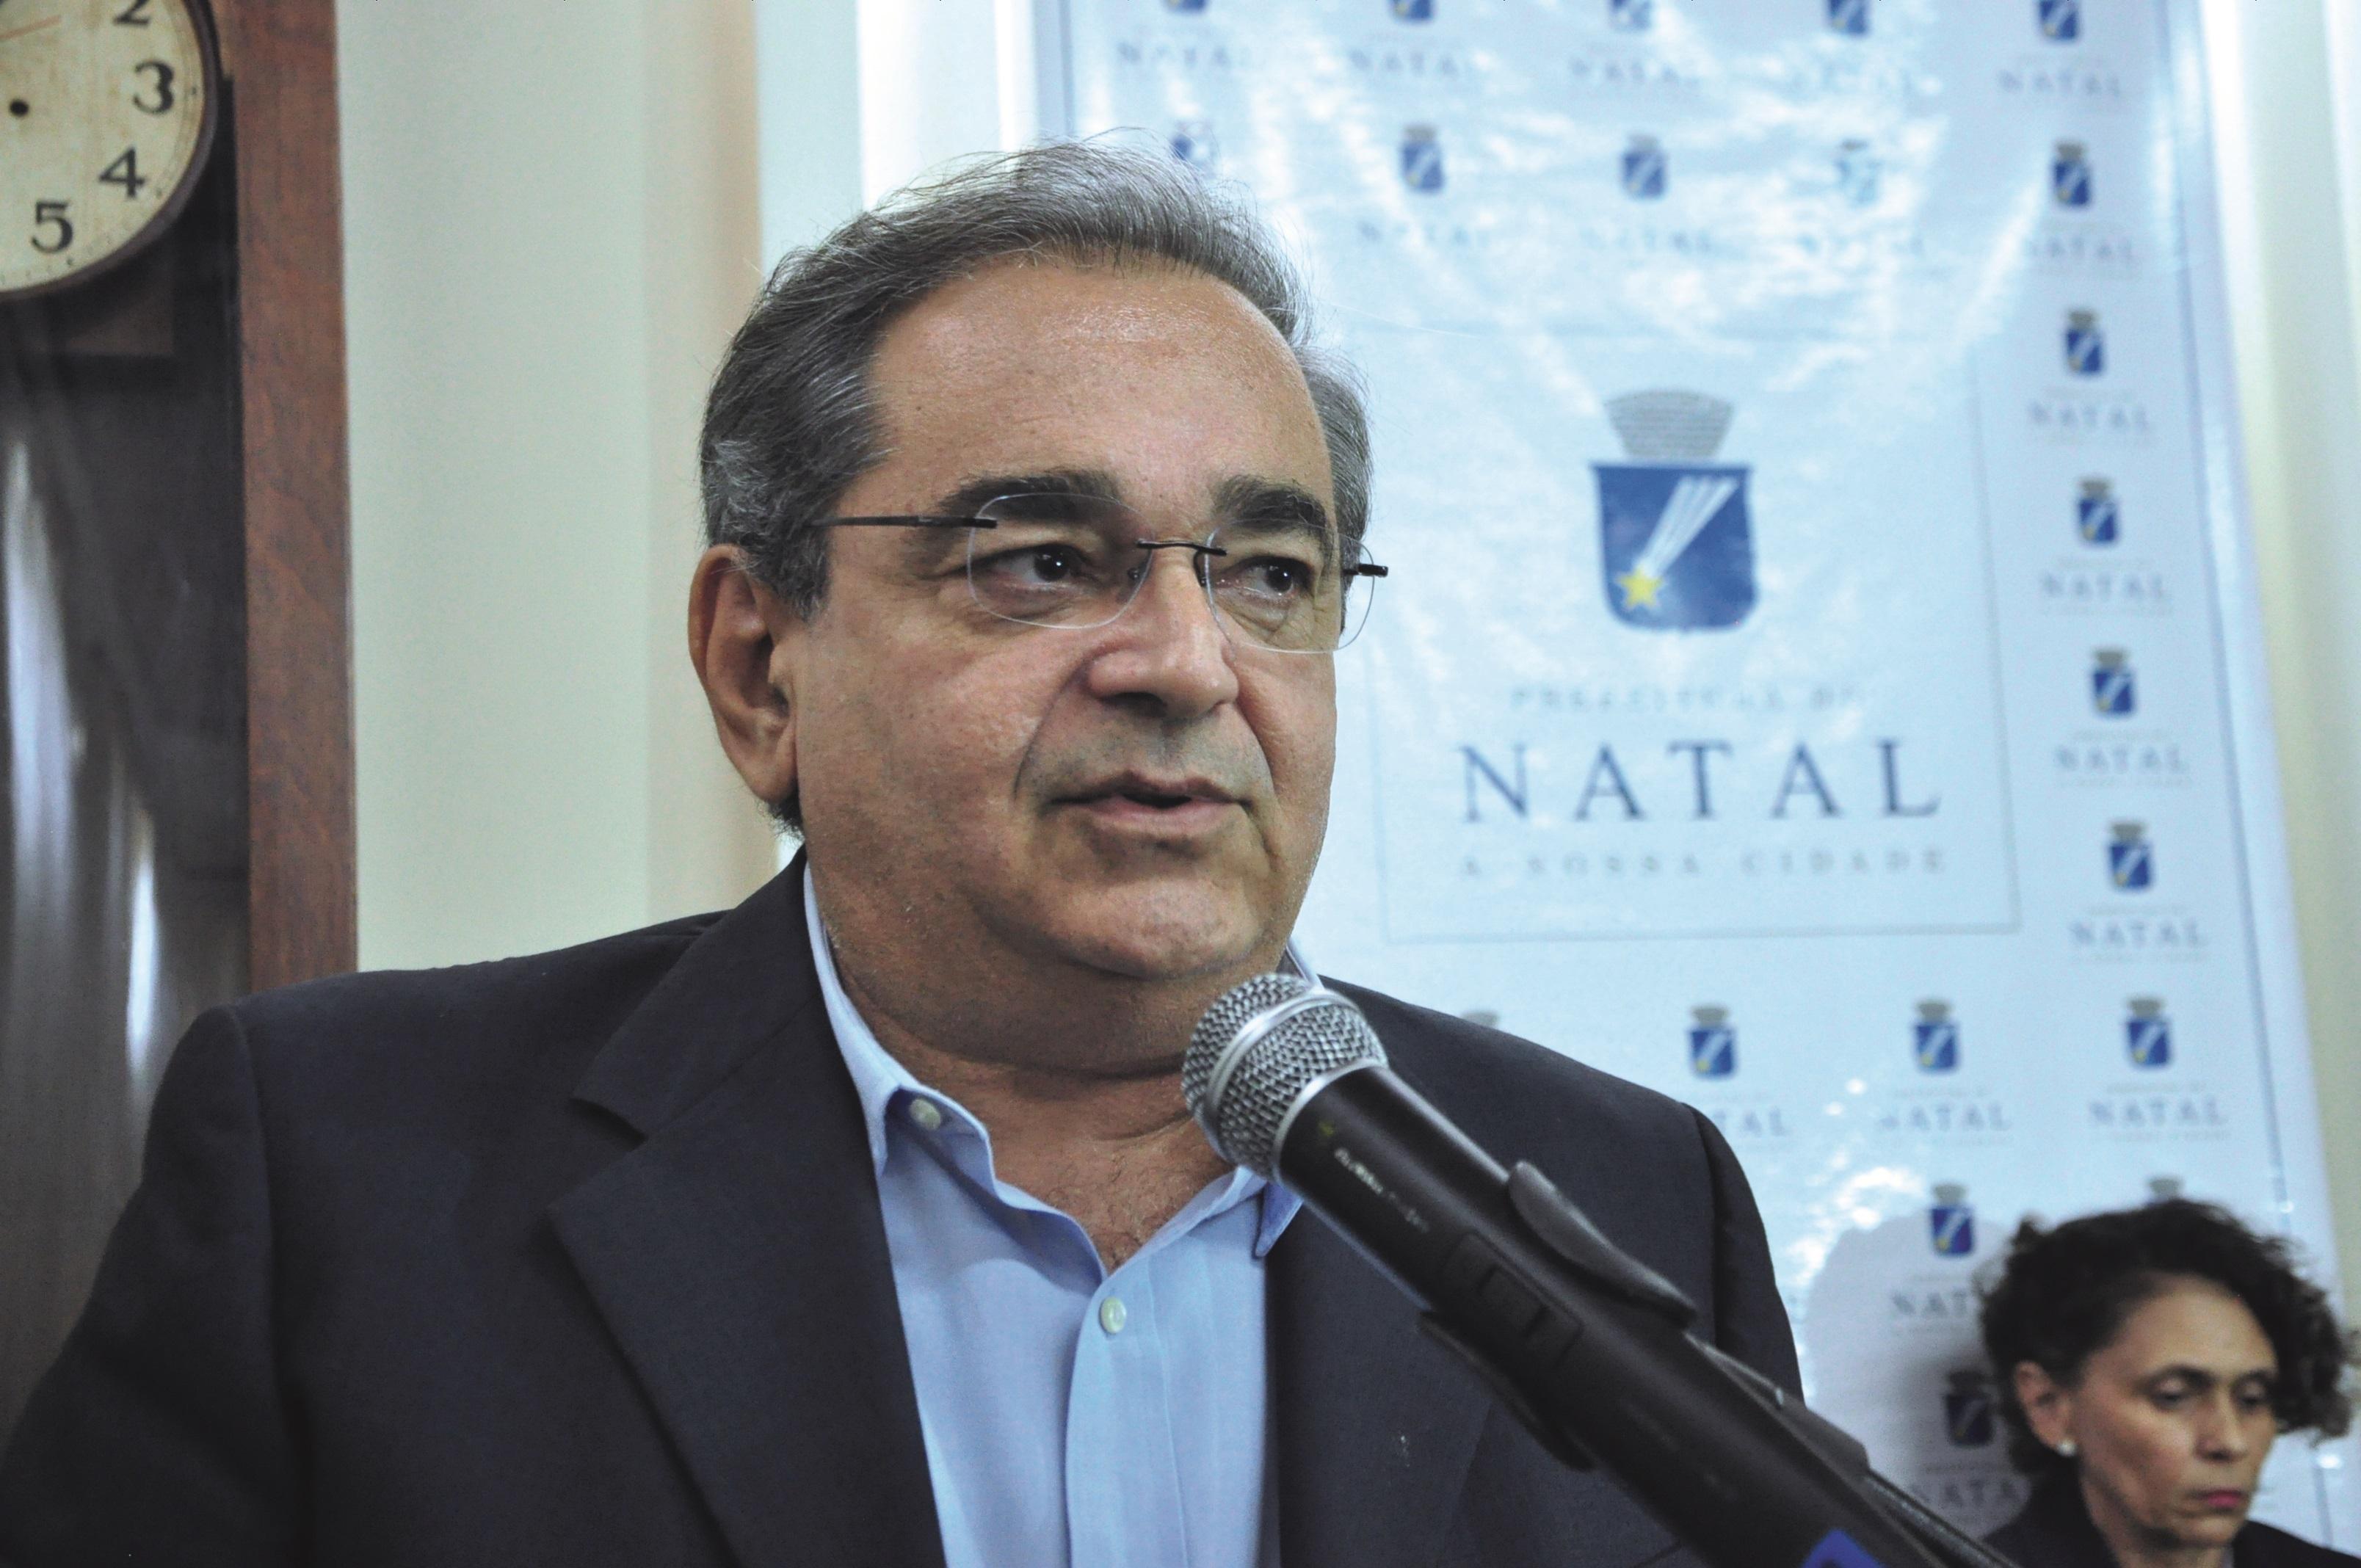 Posse de Kleber Fernandes Gabinete Civil Municipal Prefeito de Natal Alvaro Dias 184